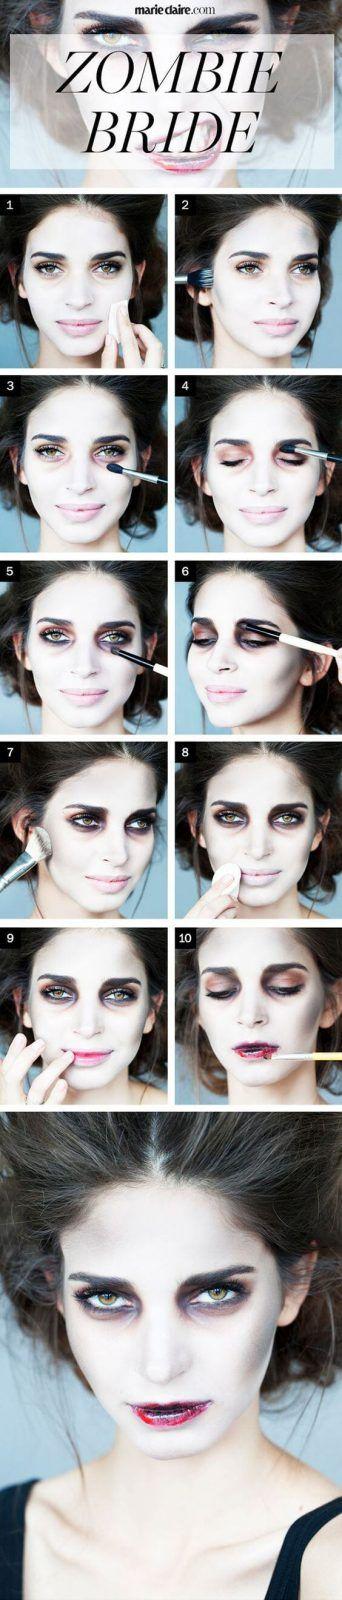 Zombiebraut Halloween Masken und Makeup-Ideen